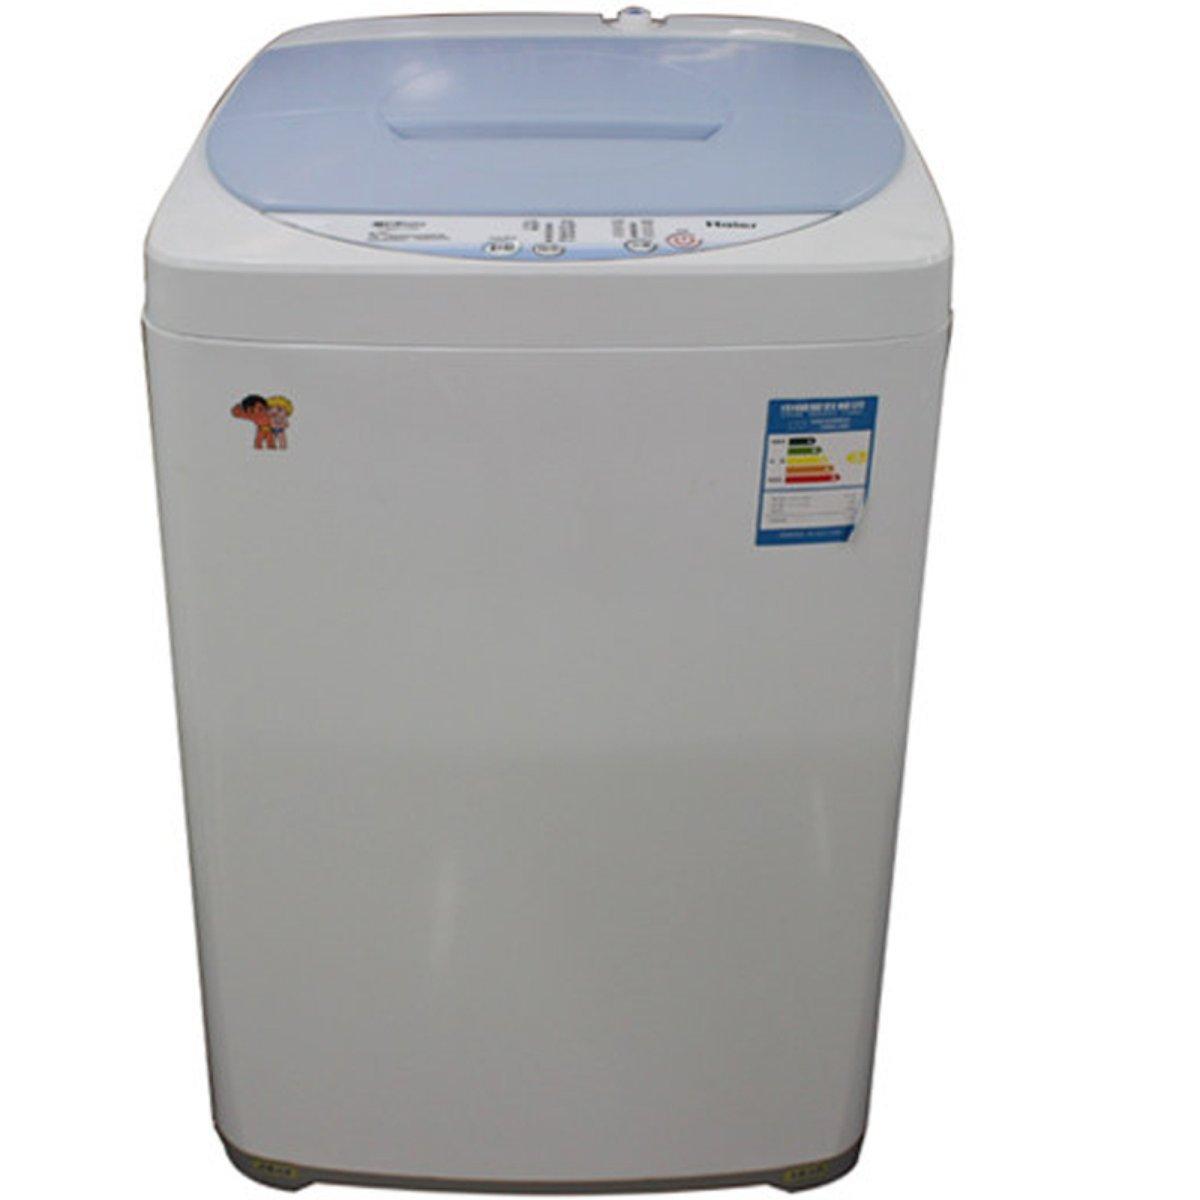 haier/海尔 xqb60-728e/洗衣机/6kg/全自动/波轮 当地